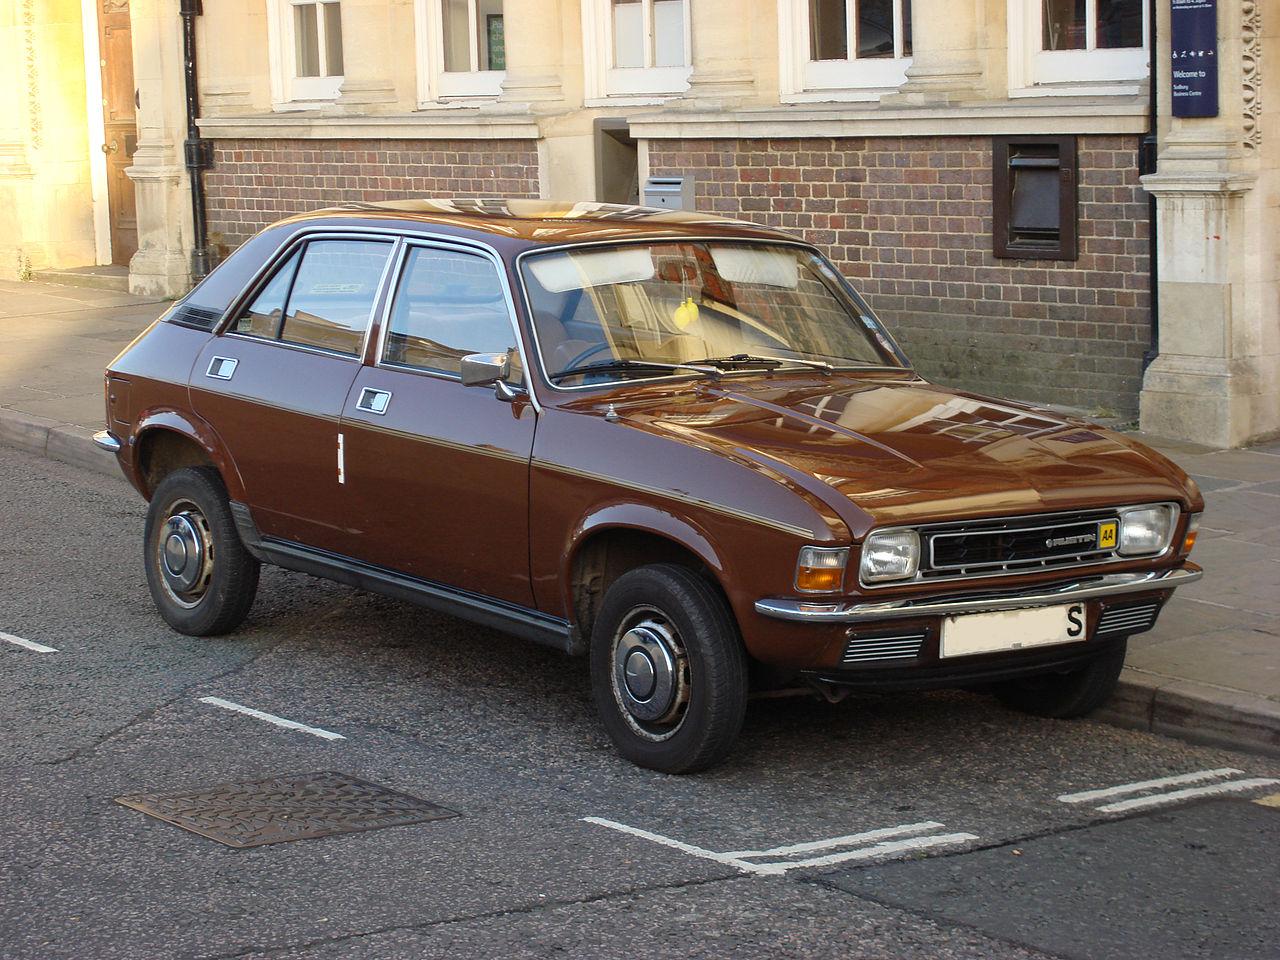 Royal Cars Rent A Car Menorca